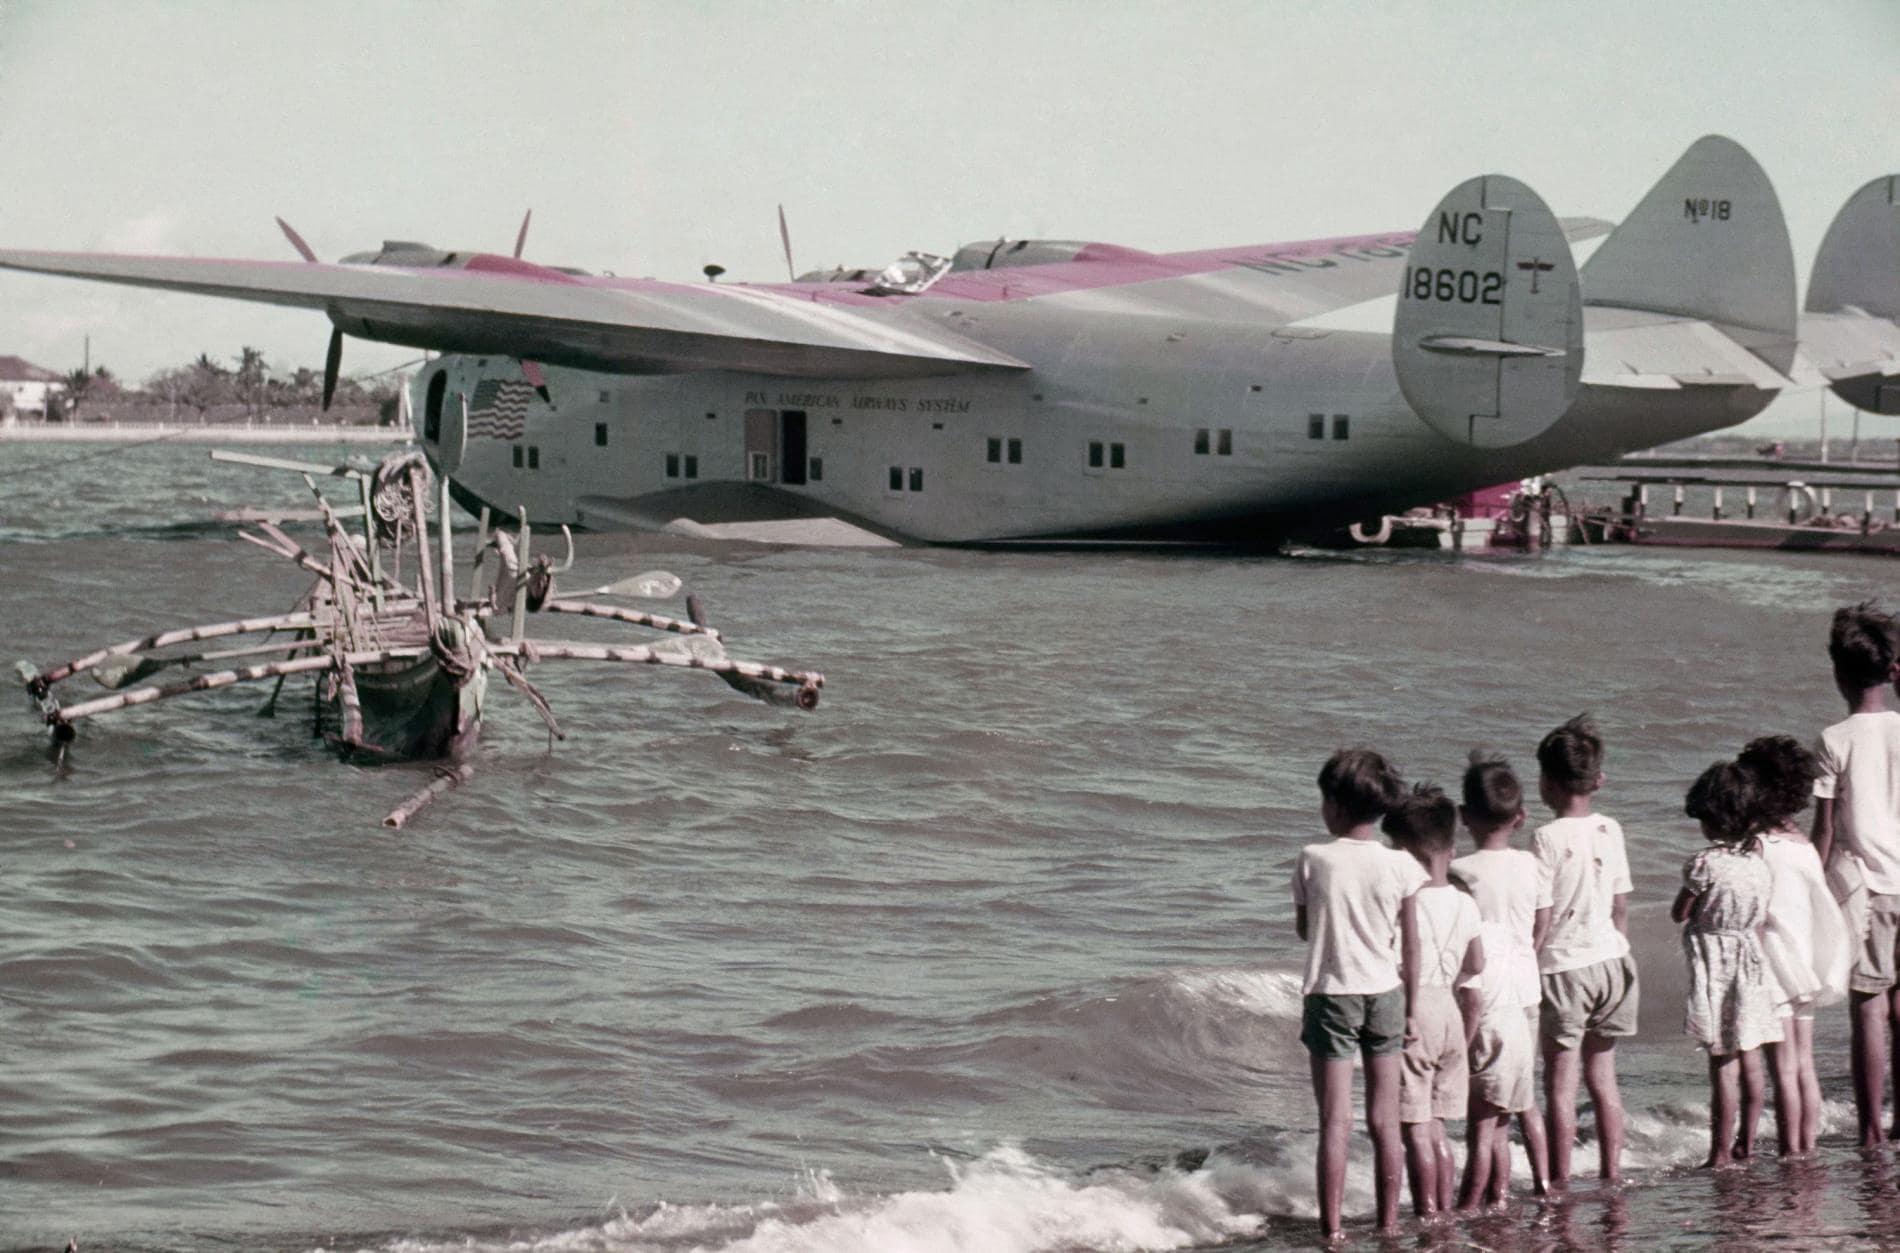 1940 philippines, Luzon, Pan Am en Cavite, en la bahía de Manila. J. BAYLOR ROBERTS